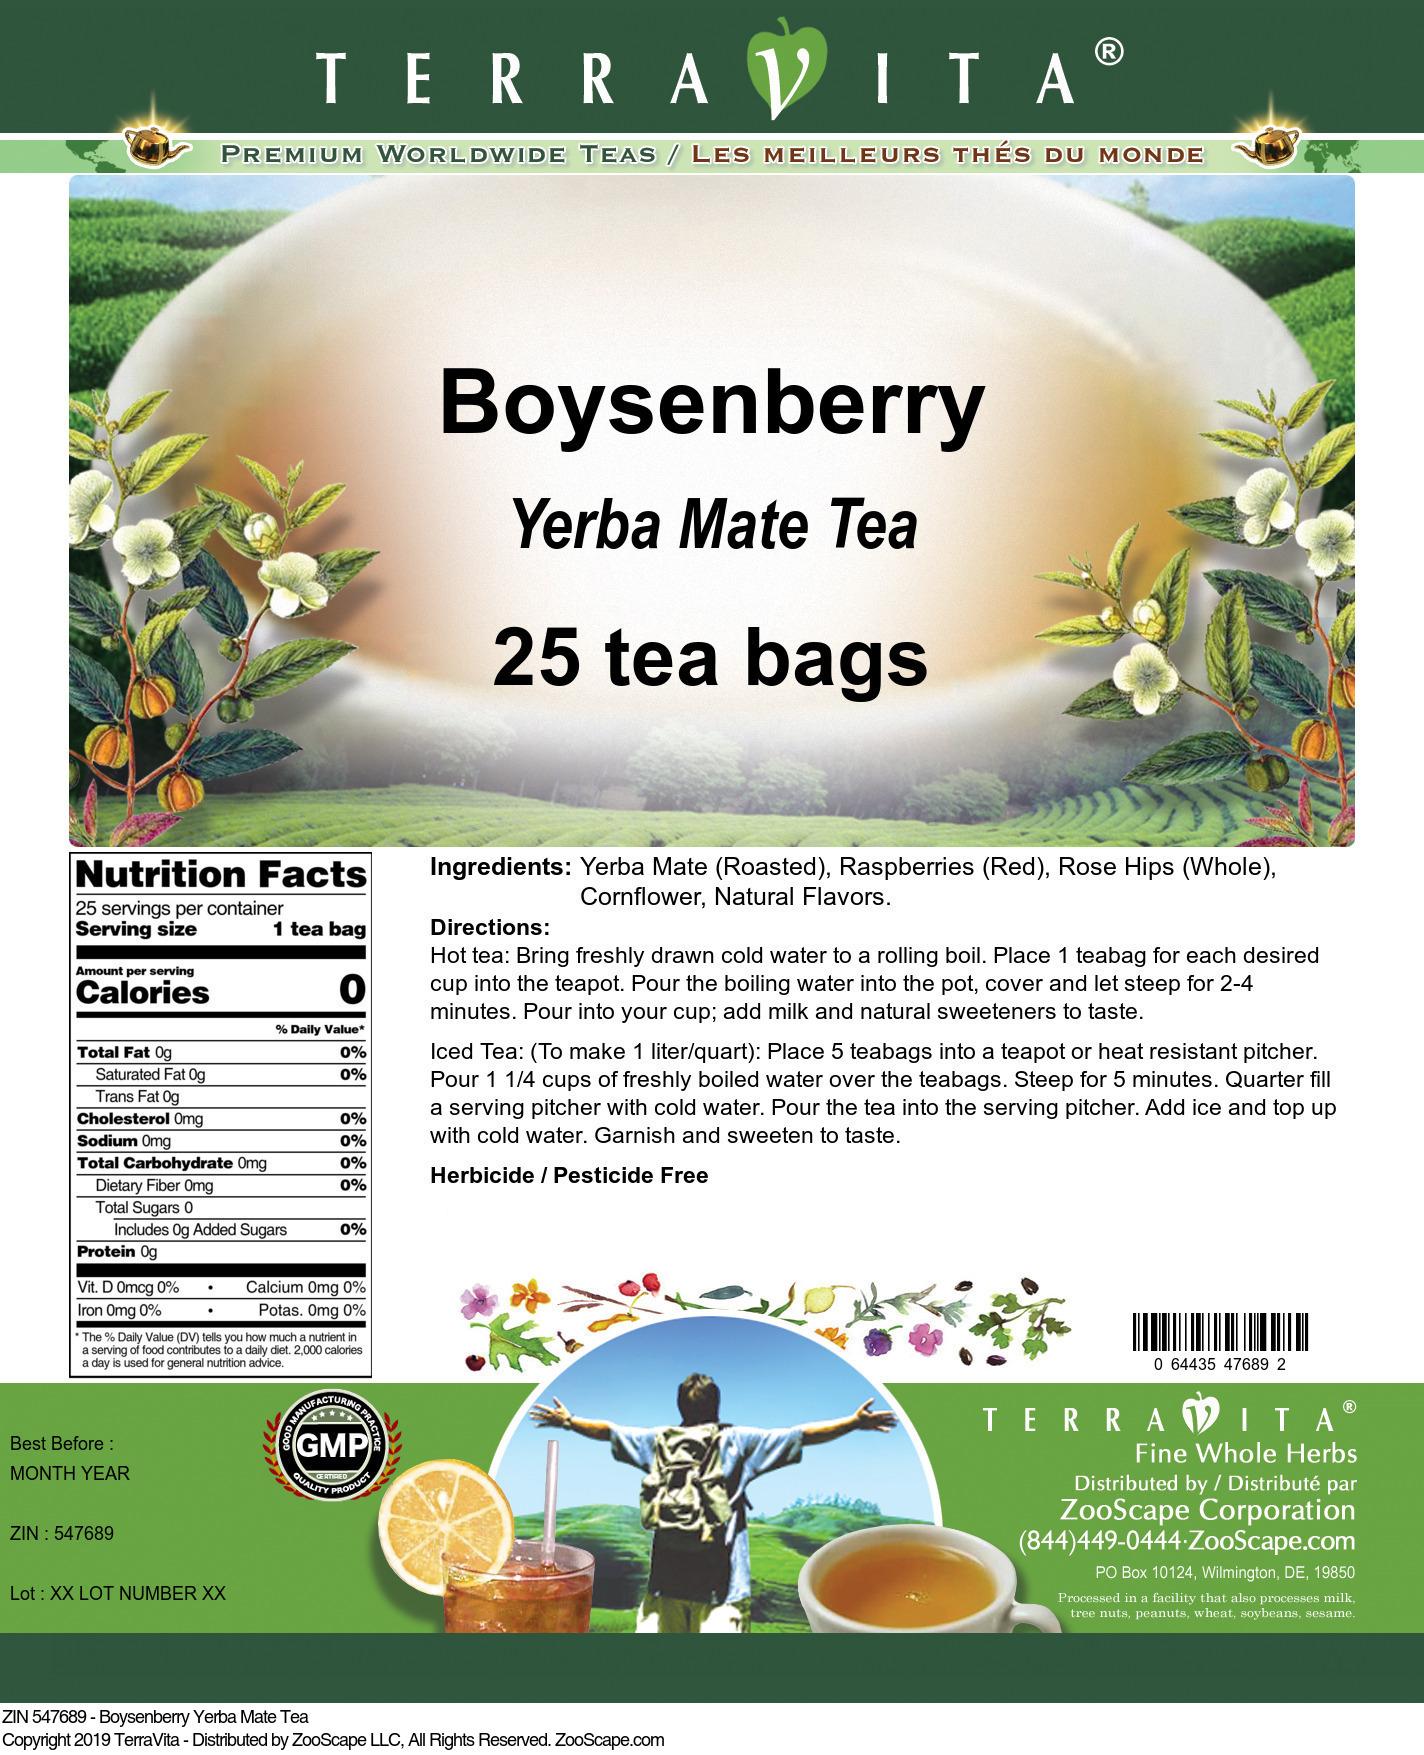 Boysenberry Yerba Mate Tea